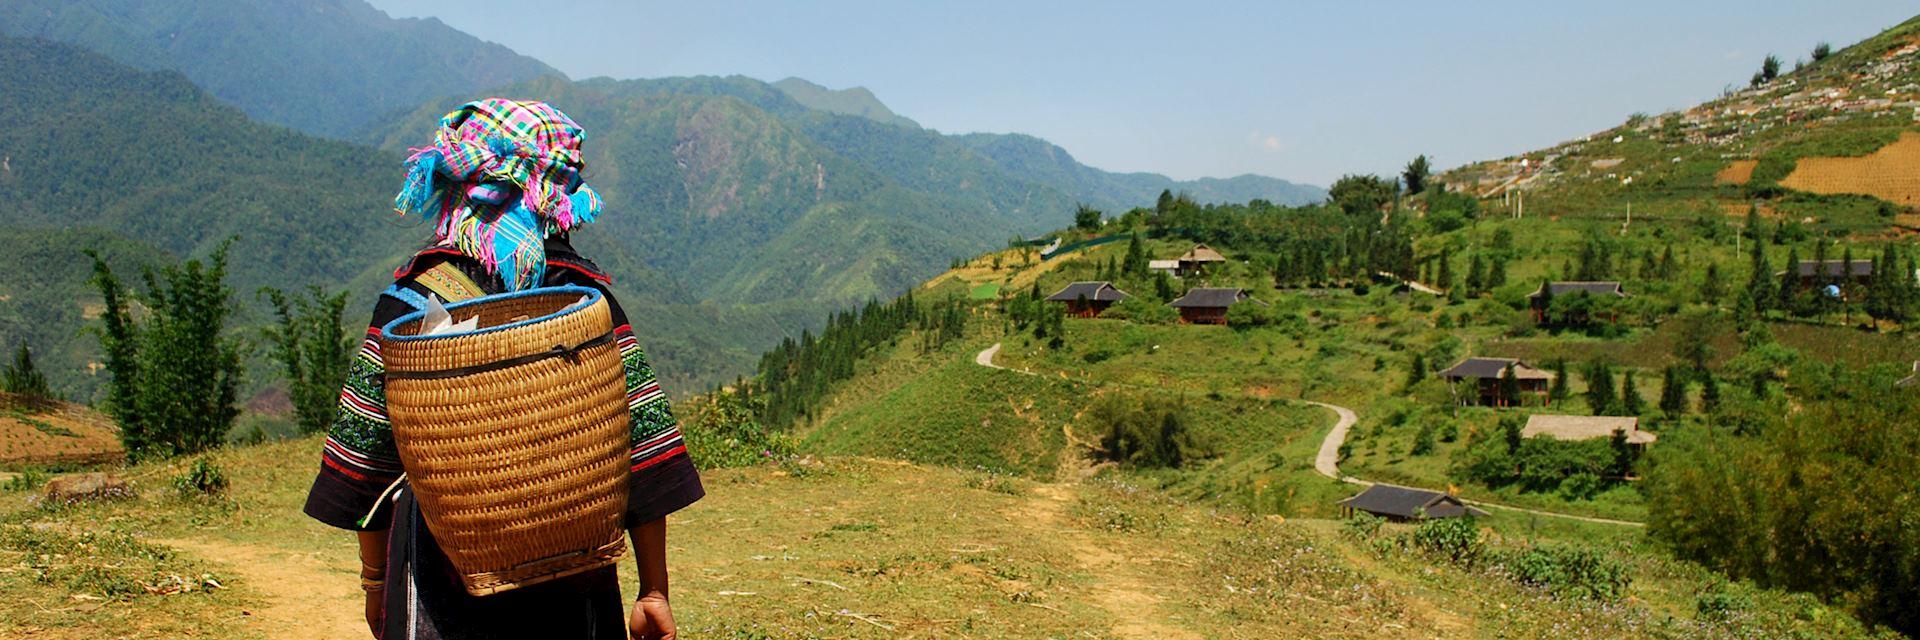 Woman from Hmong Tribe, Sapa